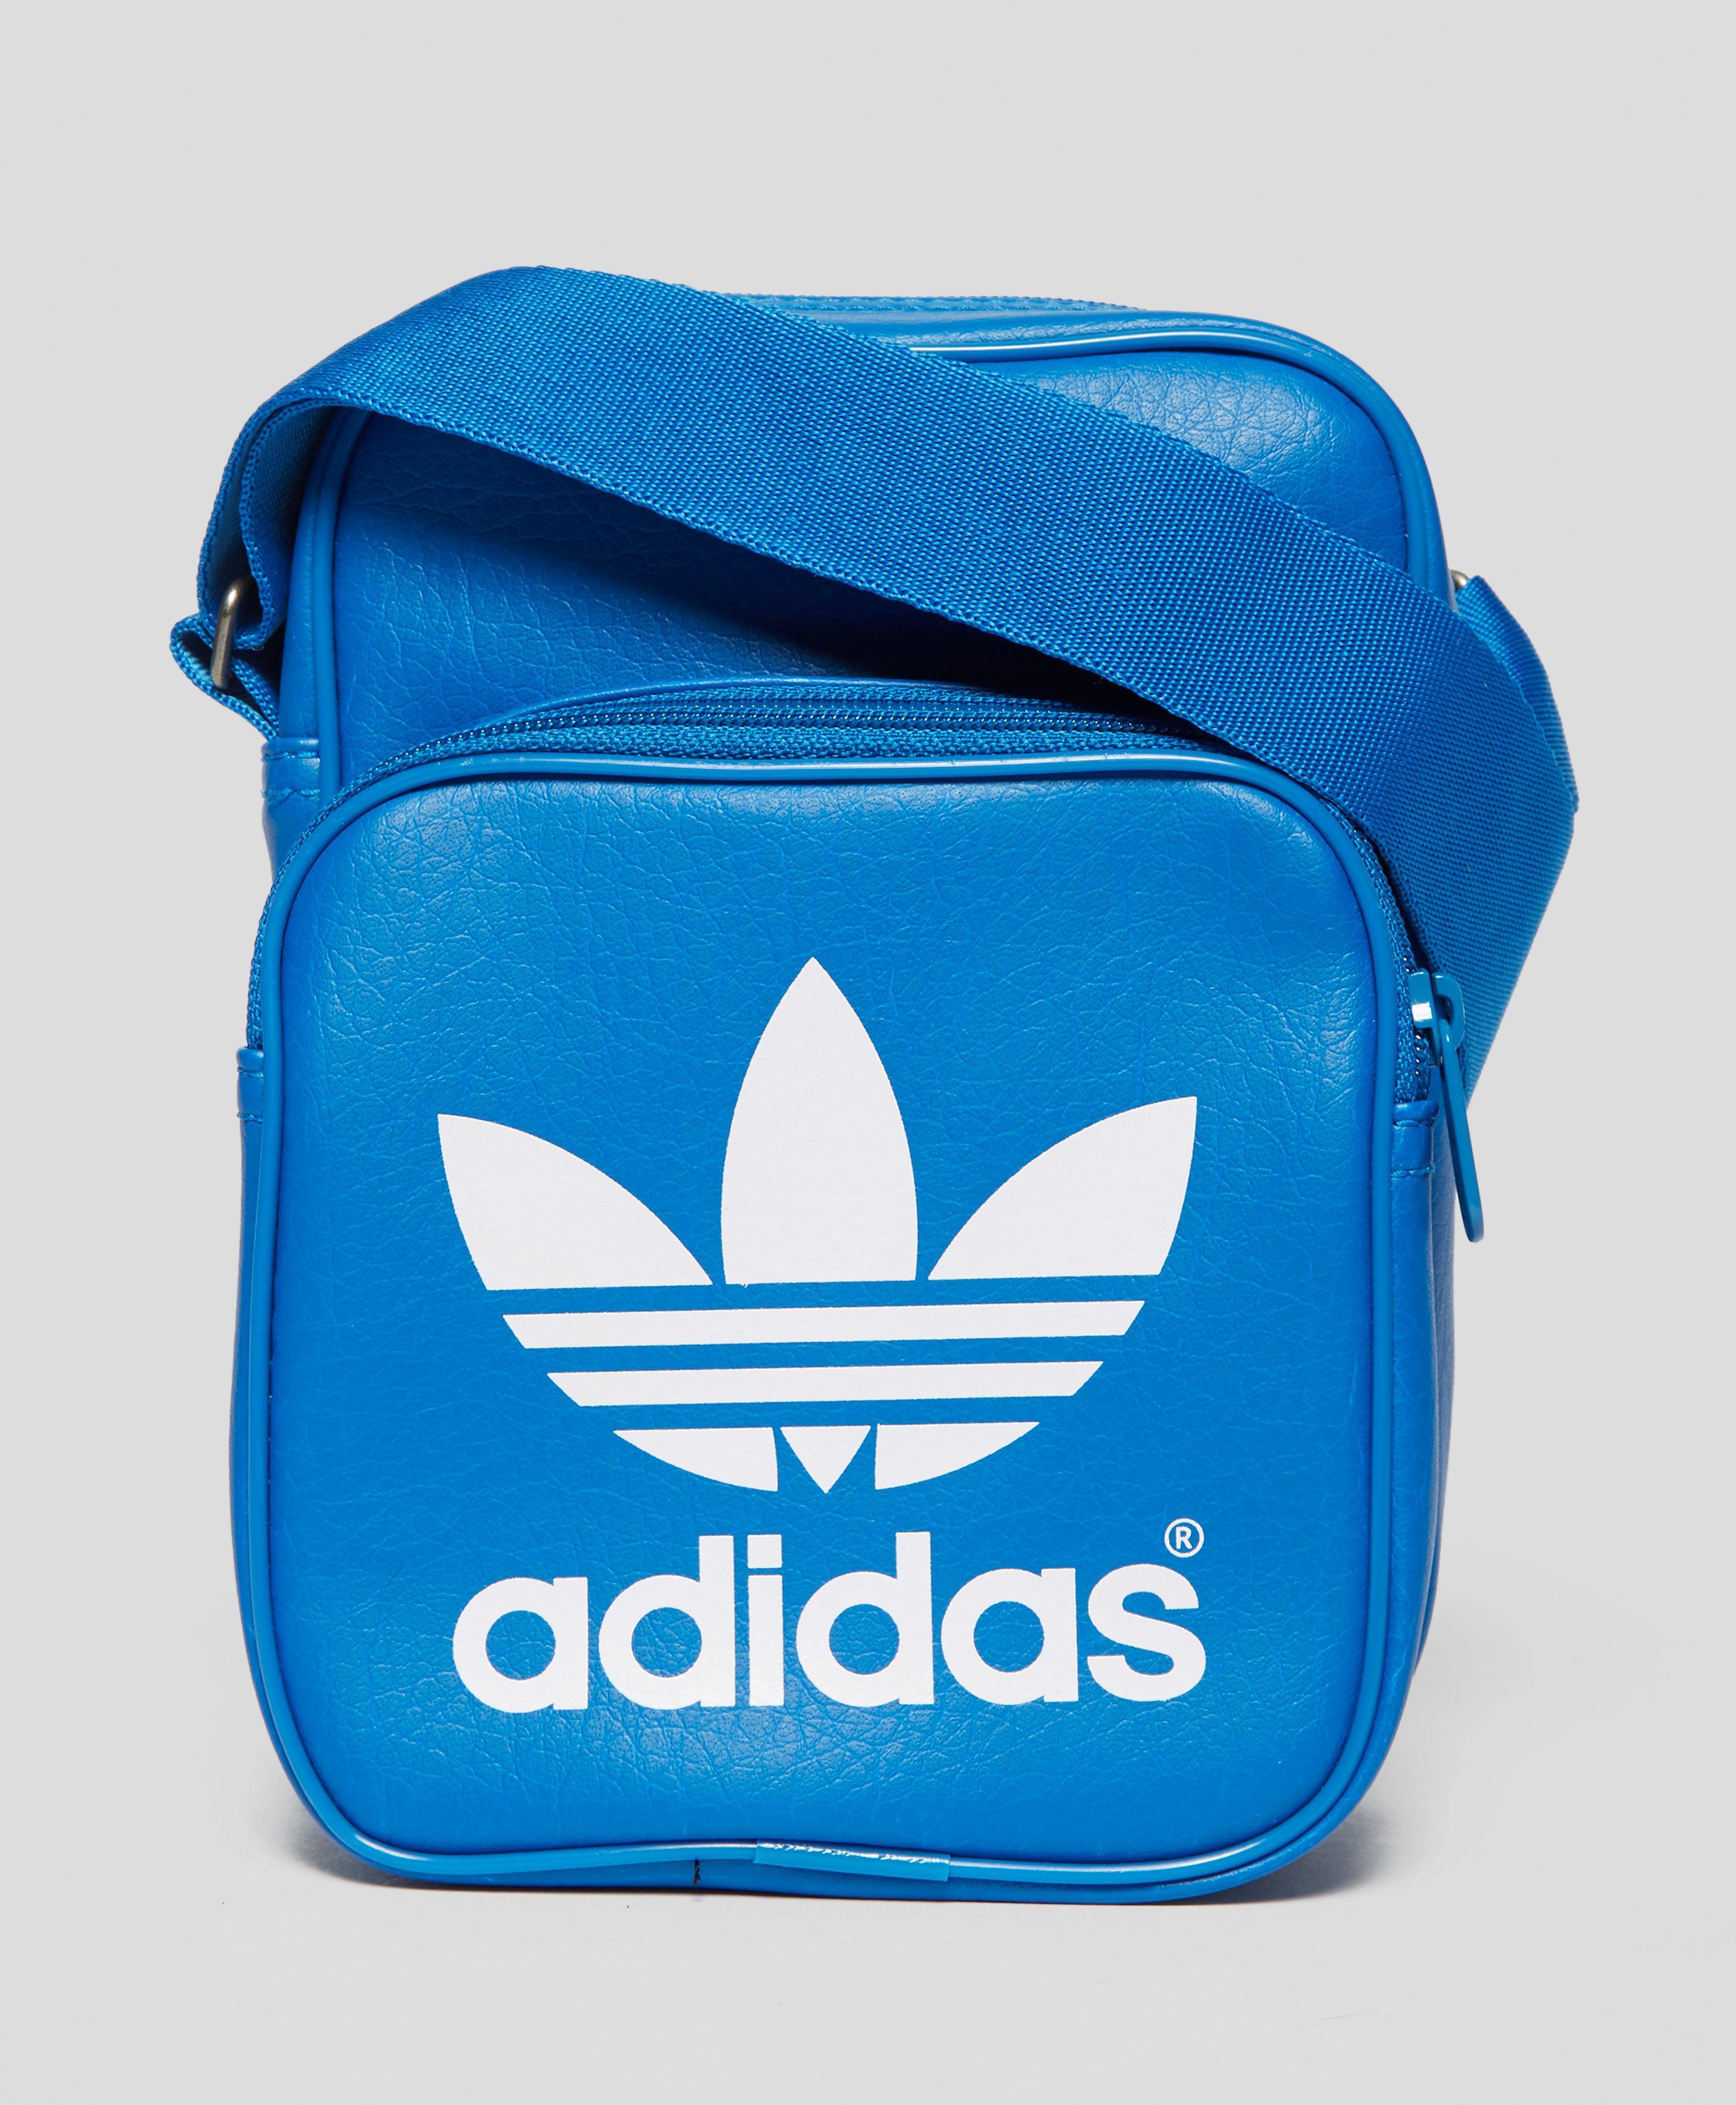 Adidas Originals Mini Classic Small Items Bag in Blue for Men - Lyst 2fb46f7863f4c